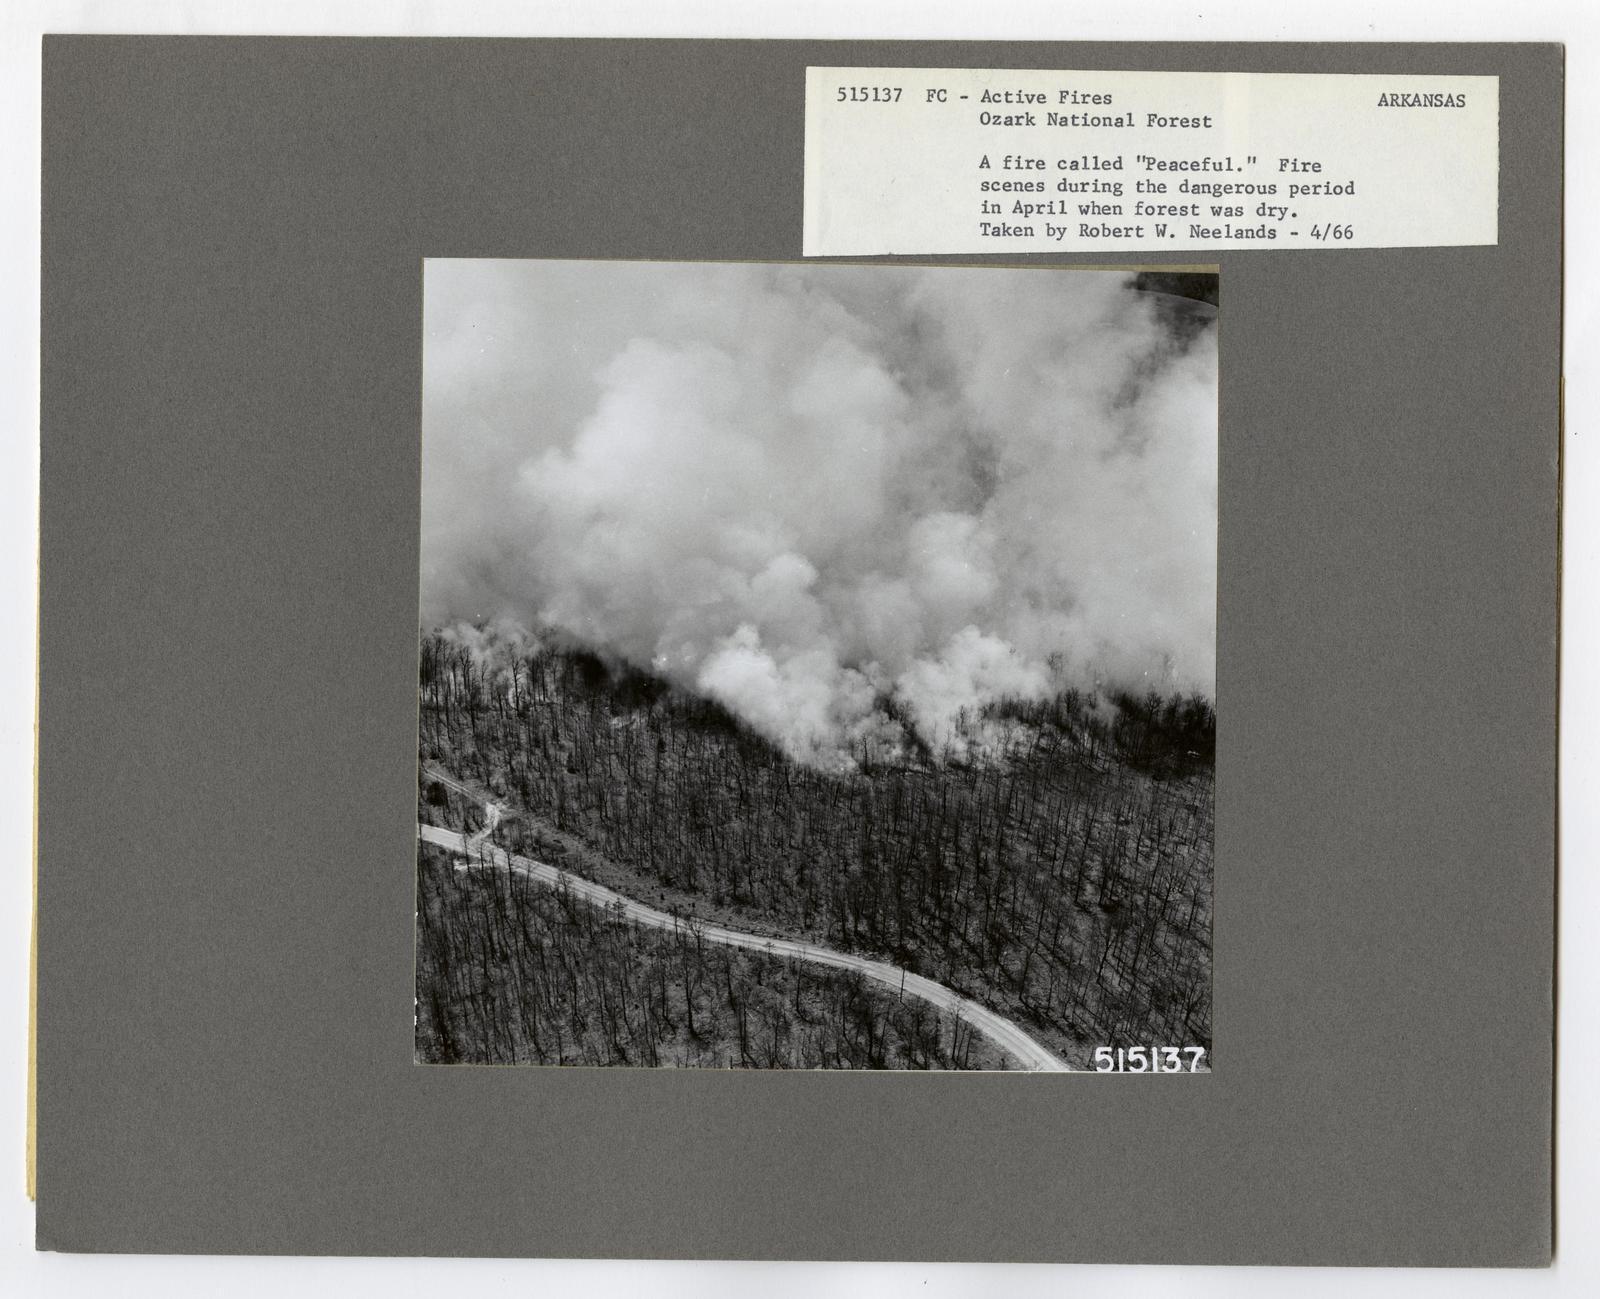 Active Fires - Arkansas